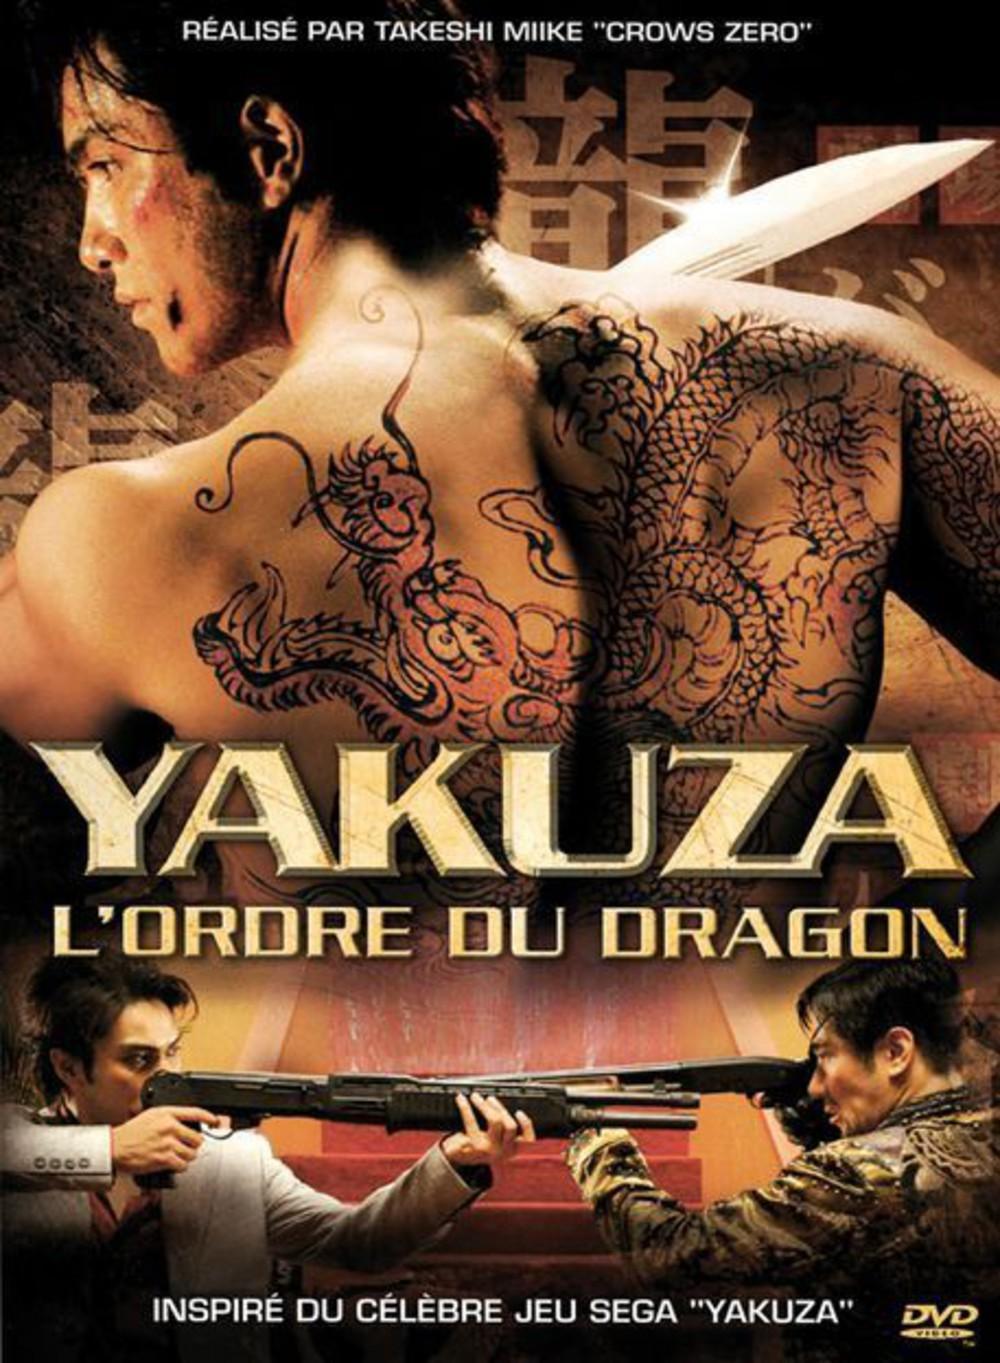 affiche du film Yakuza : L'ordre du dragon